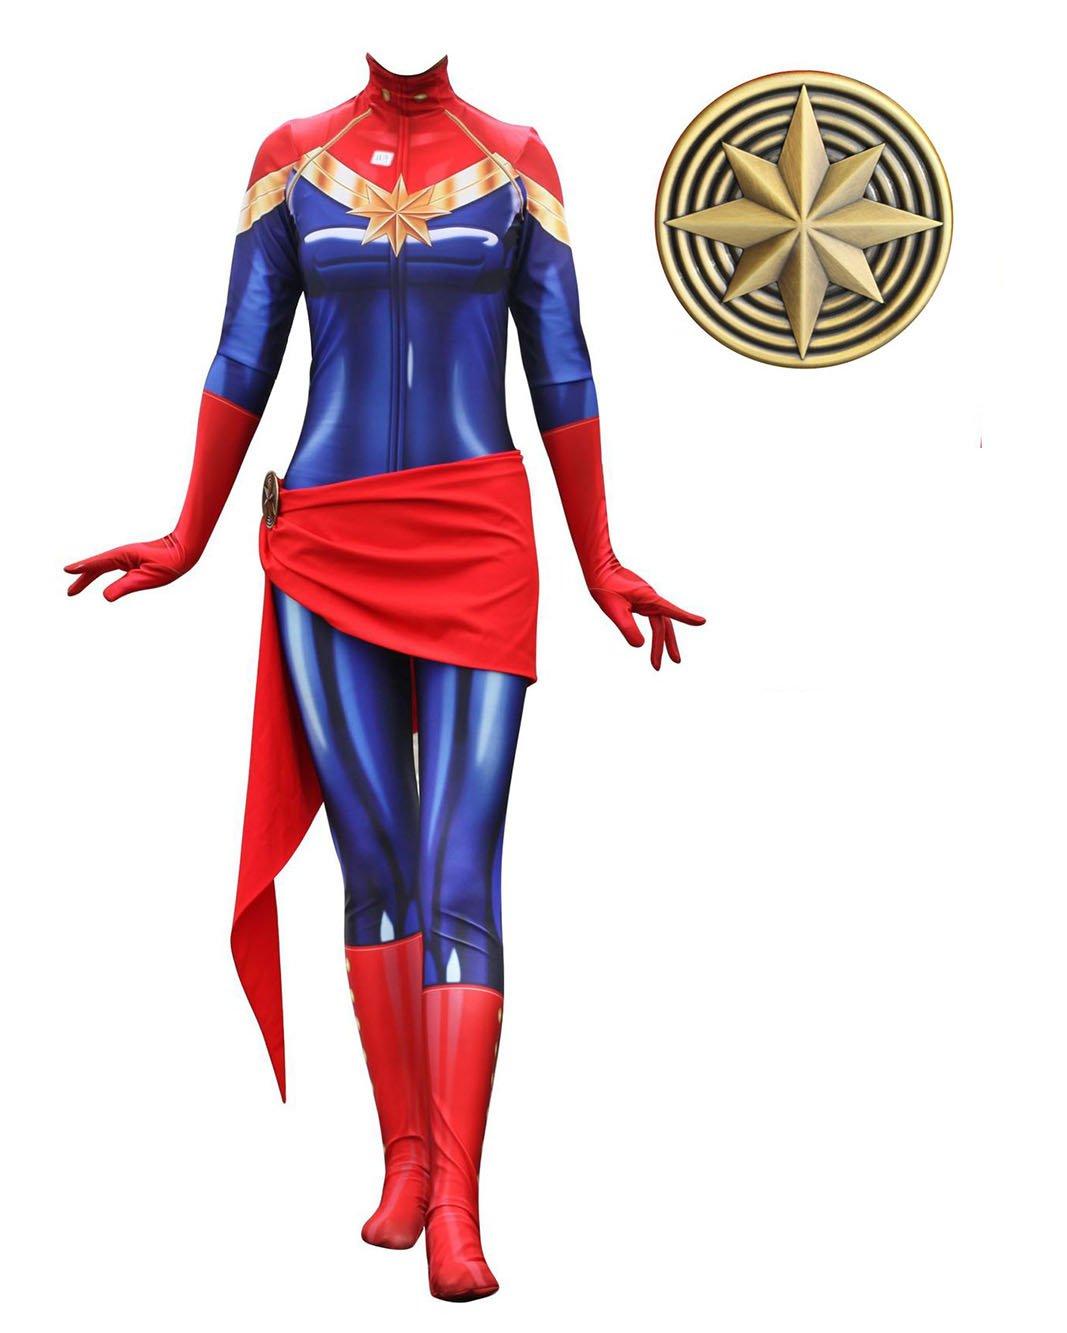 - 61J4SUsXnEL - Texmex Cosplay Lady Captain Suit Halloween Costume Spandex Bodysuit Zentai